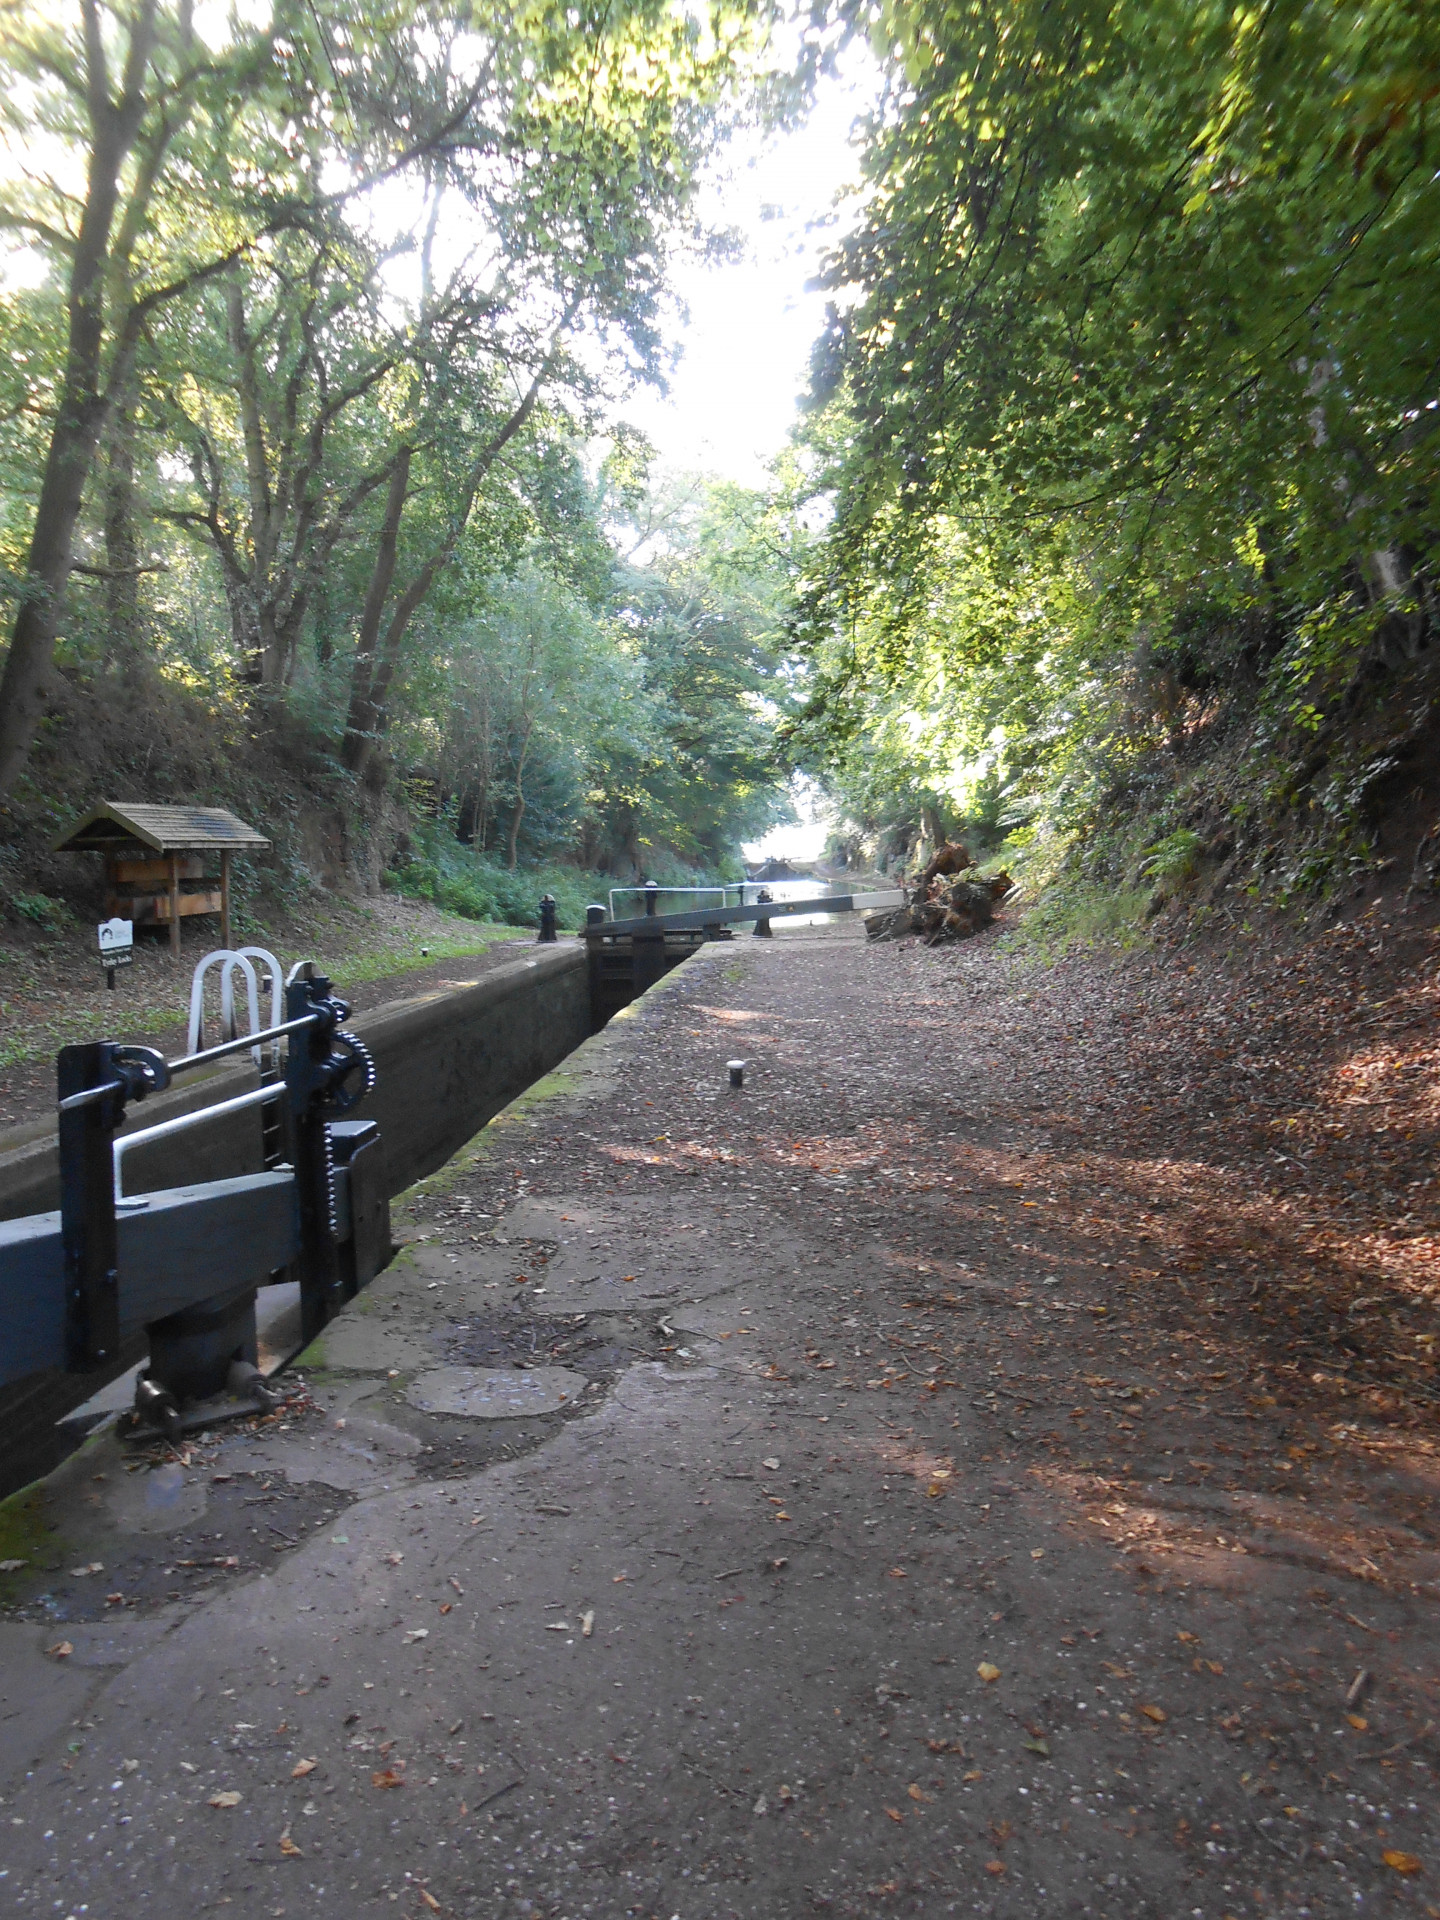 Tyrley Bottom Lock